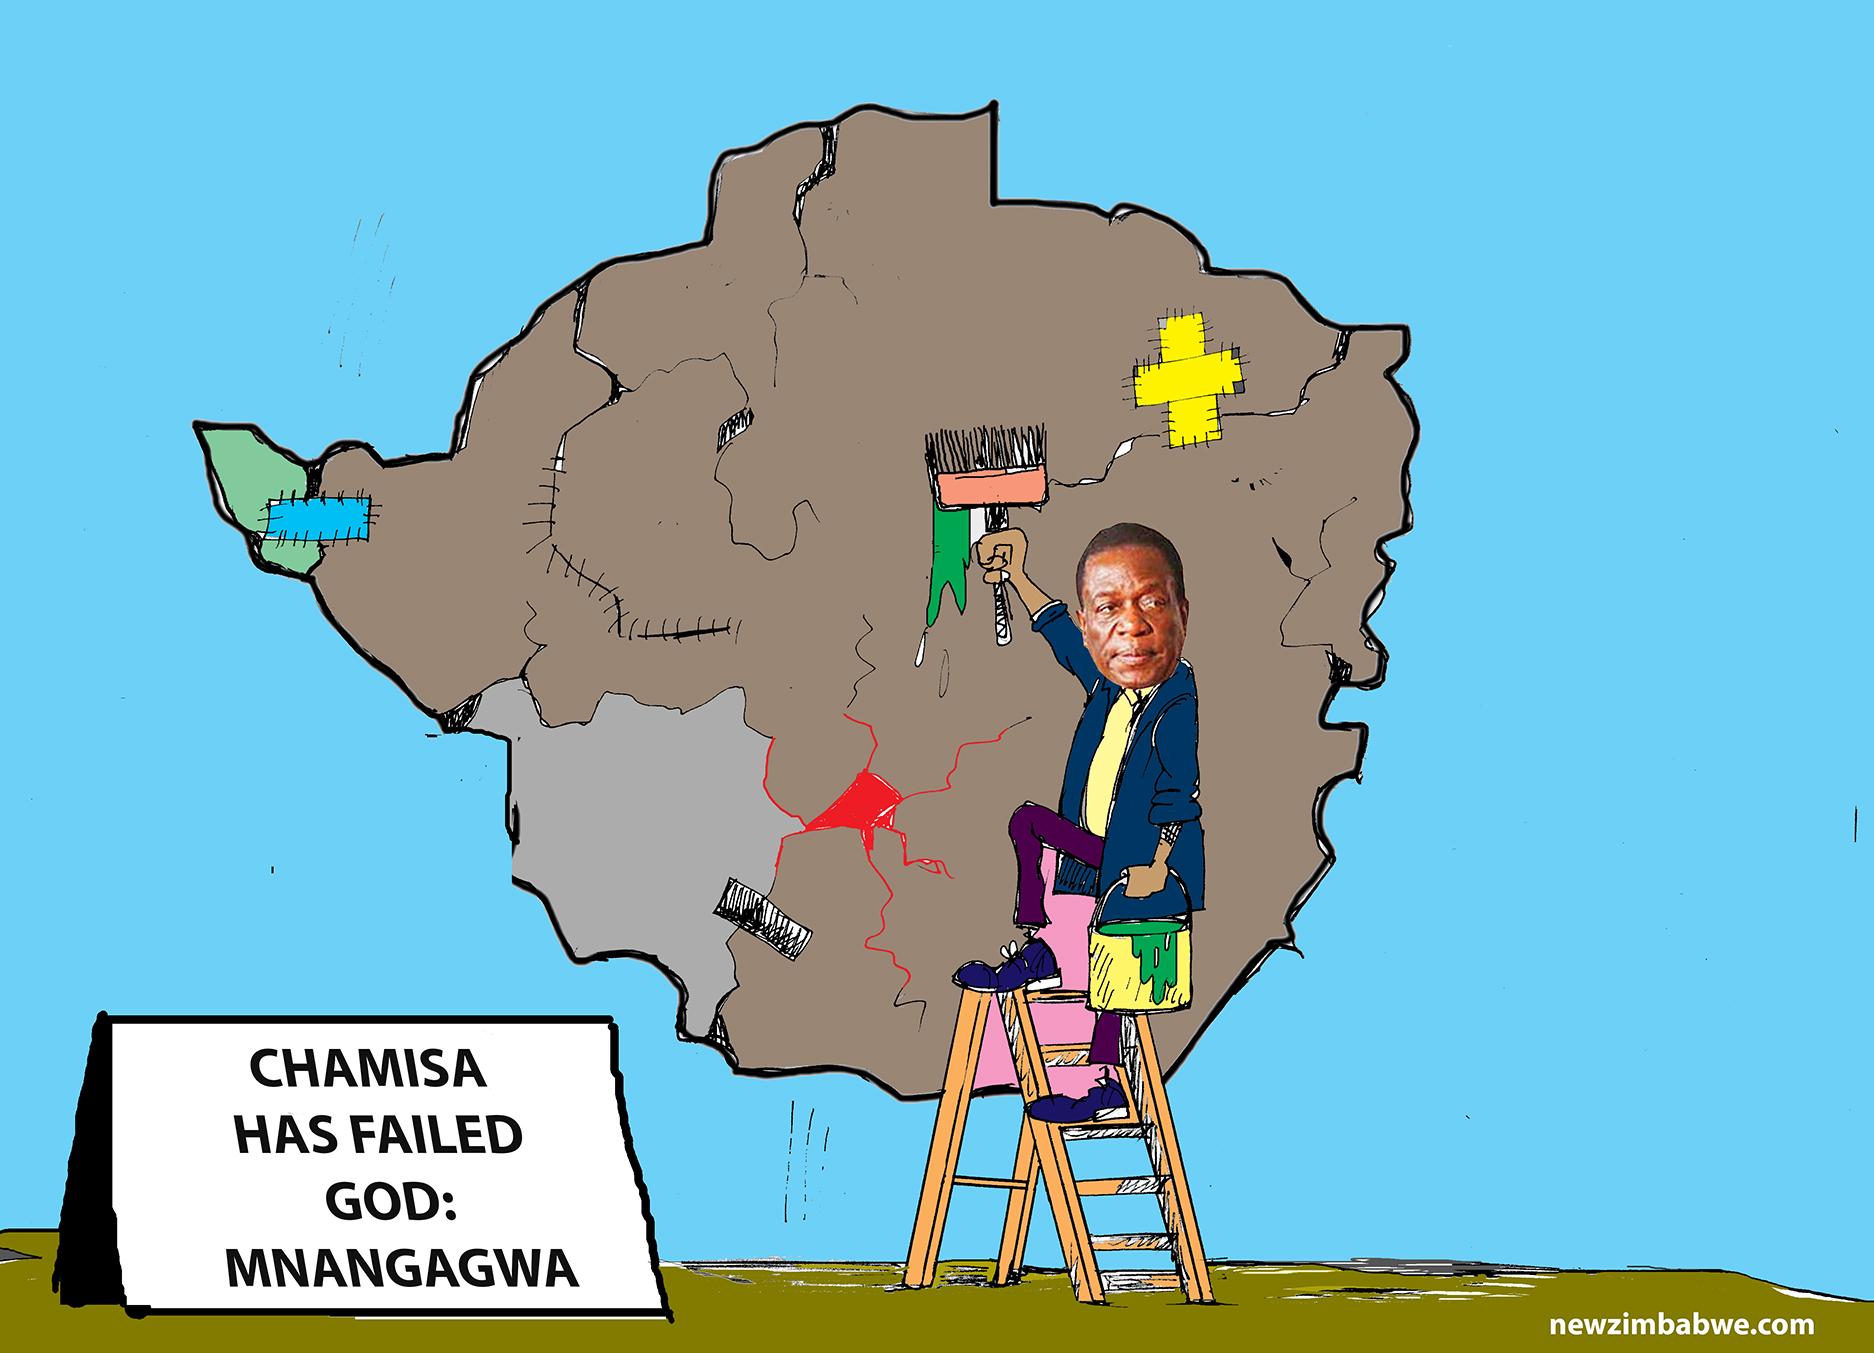 Chamisa has failed Zimbabwe : Mnangagwa